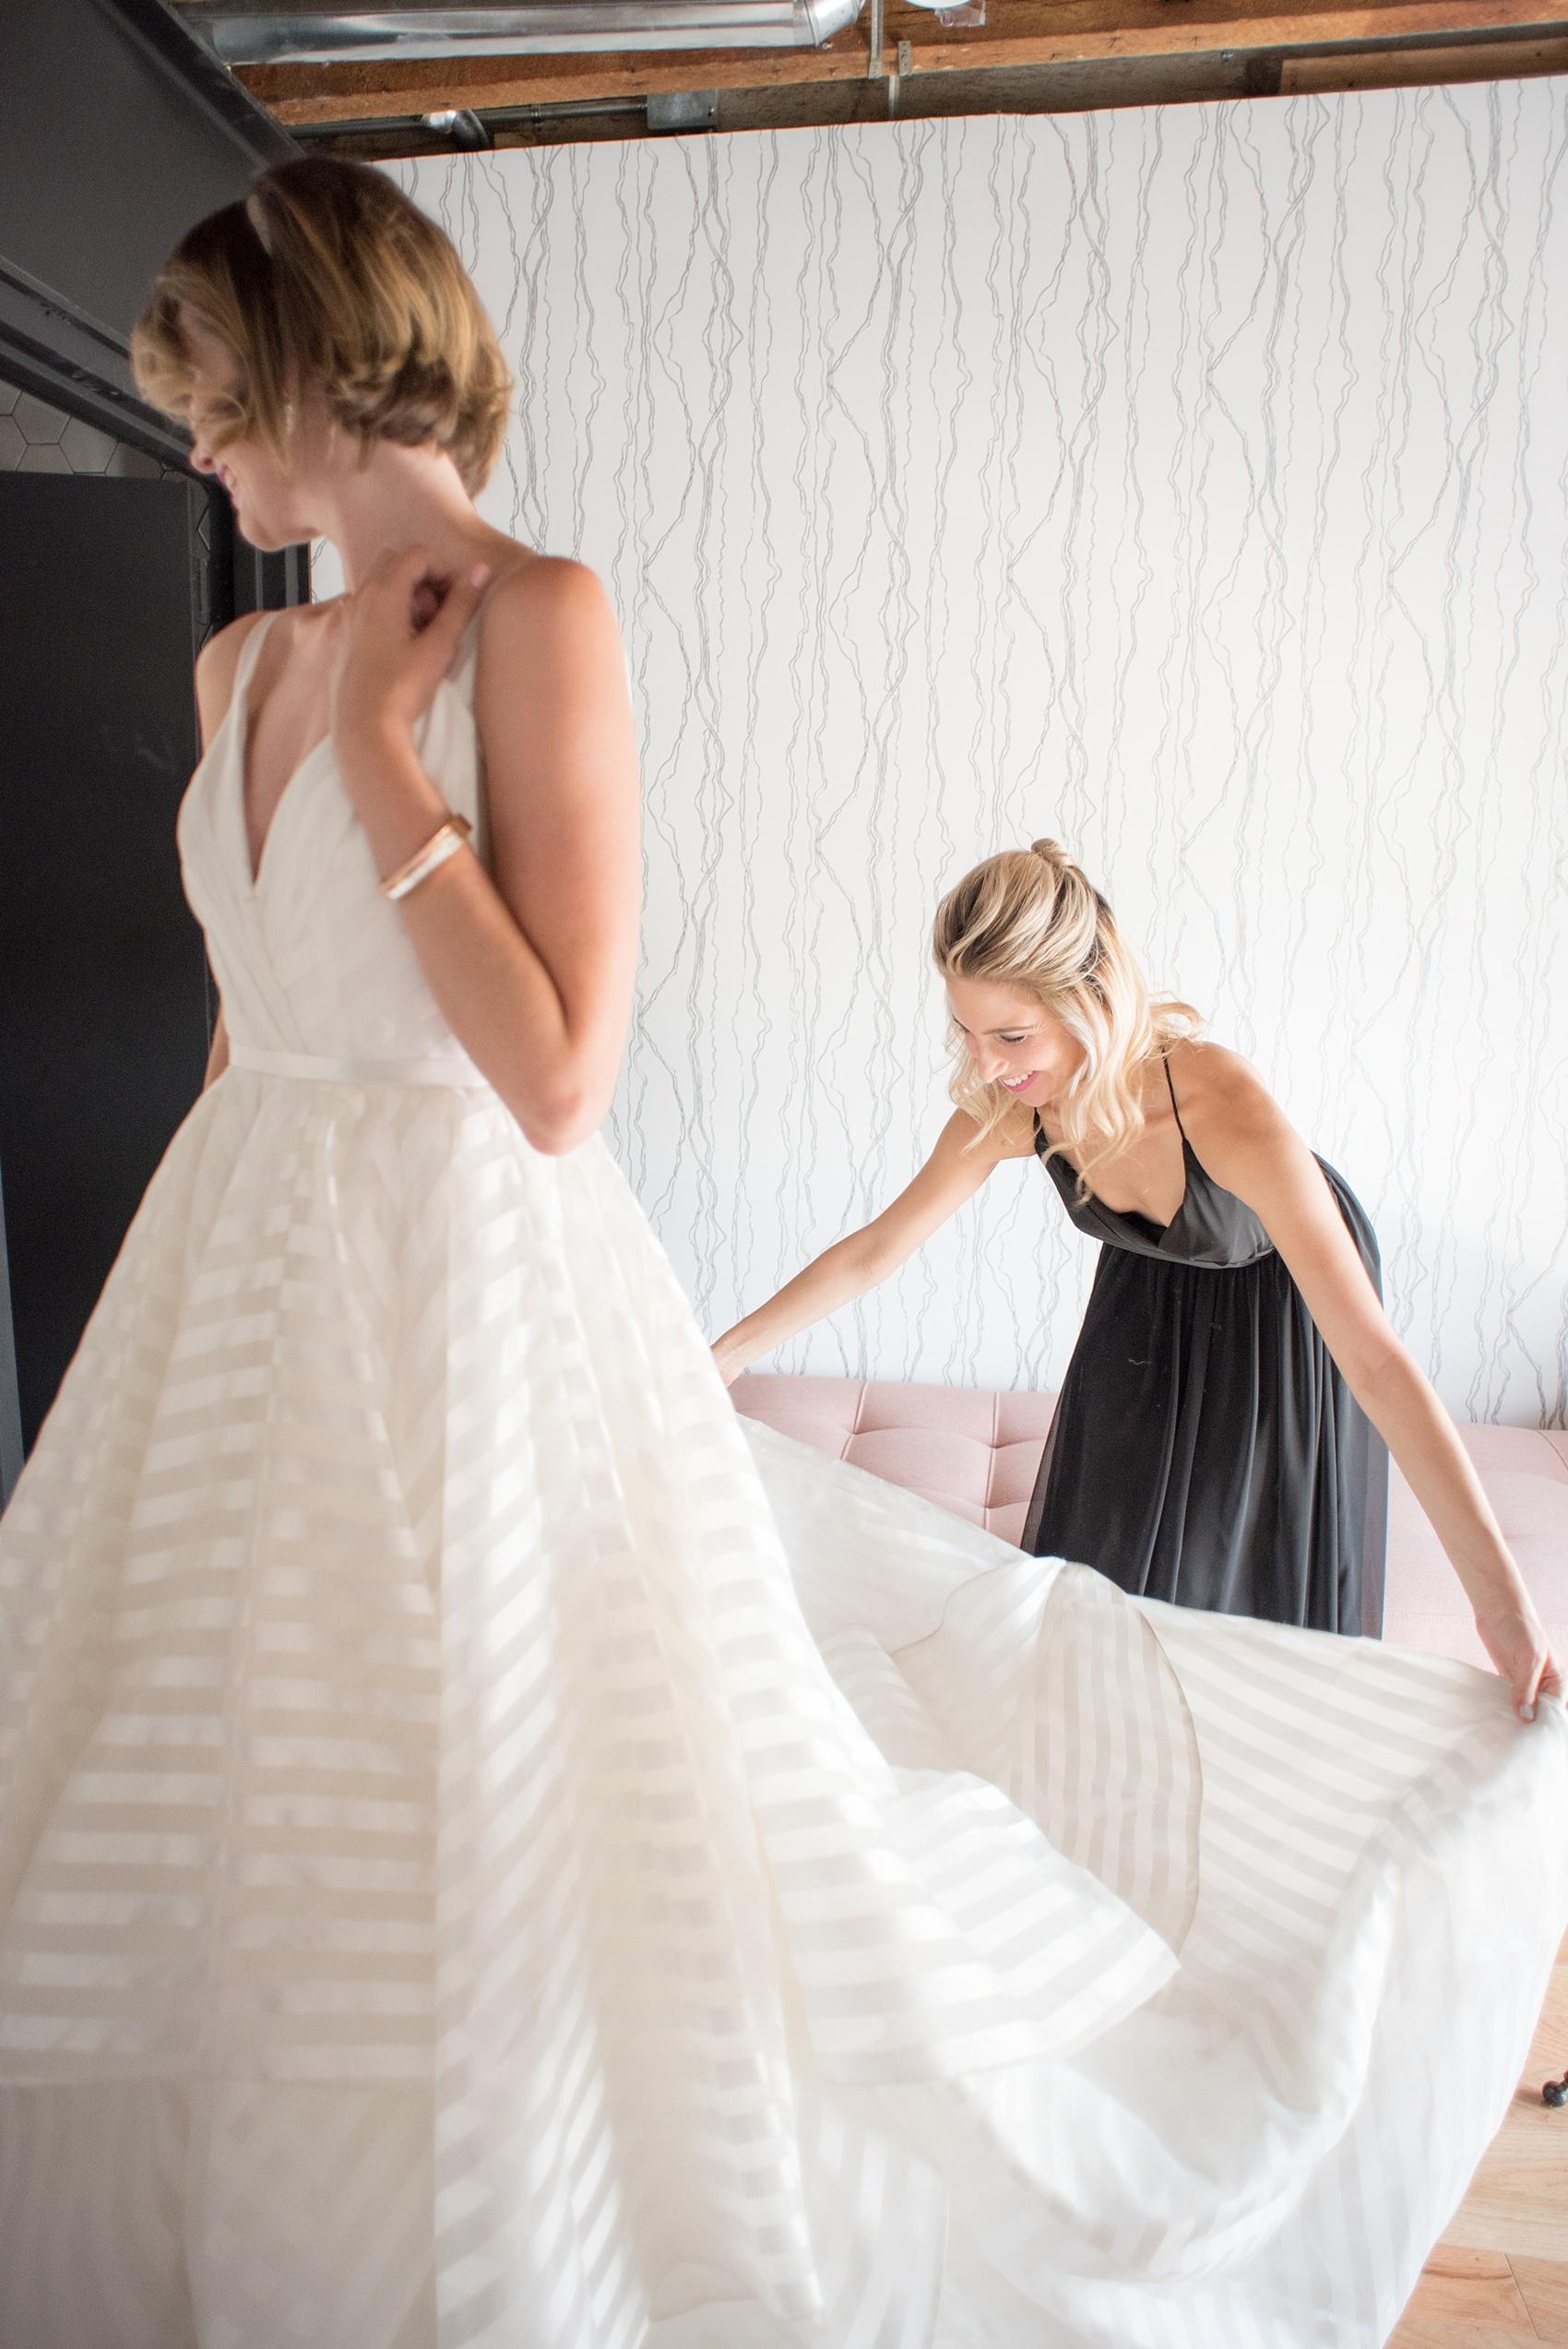 Dobbin St Brooklyn Wedding Photos | Raleigh and NYC Wedding ...